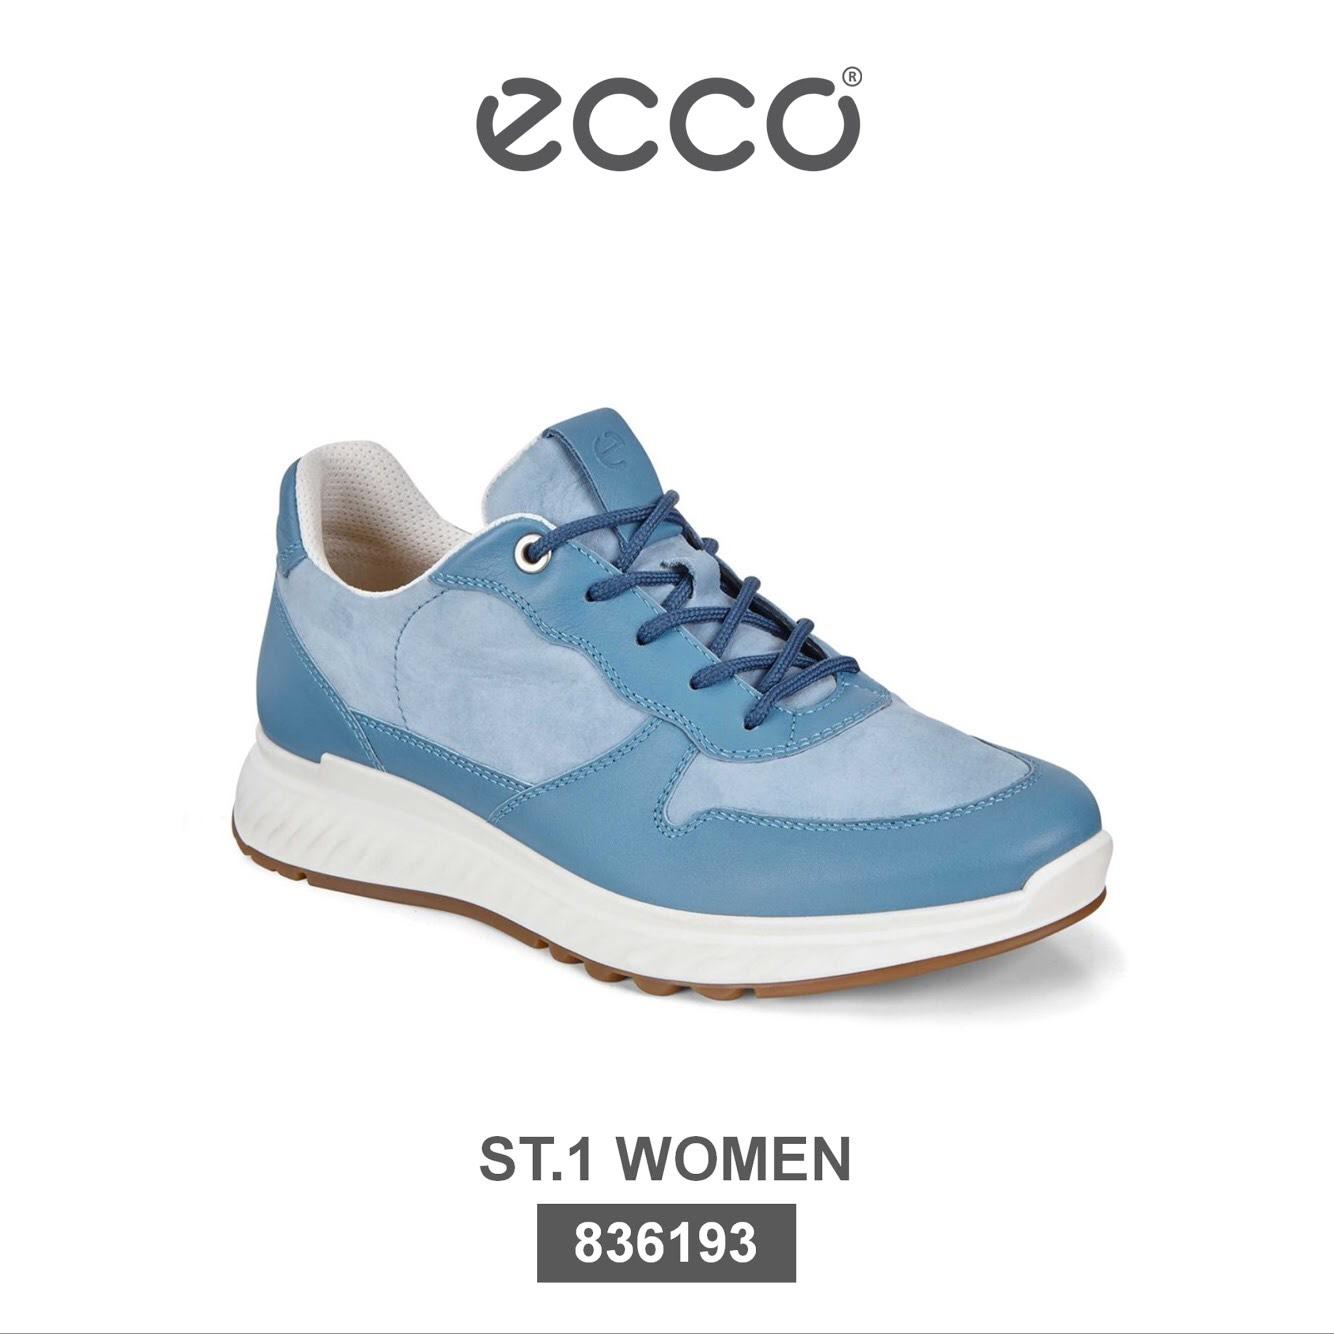 ECCO – NEW SHOCK THRU COLLECTION